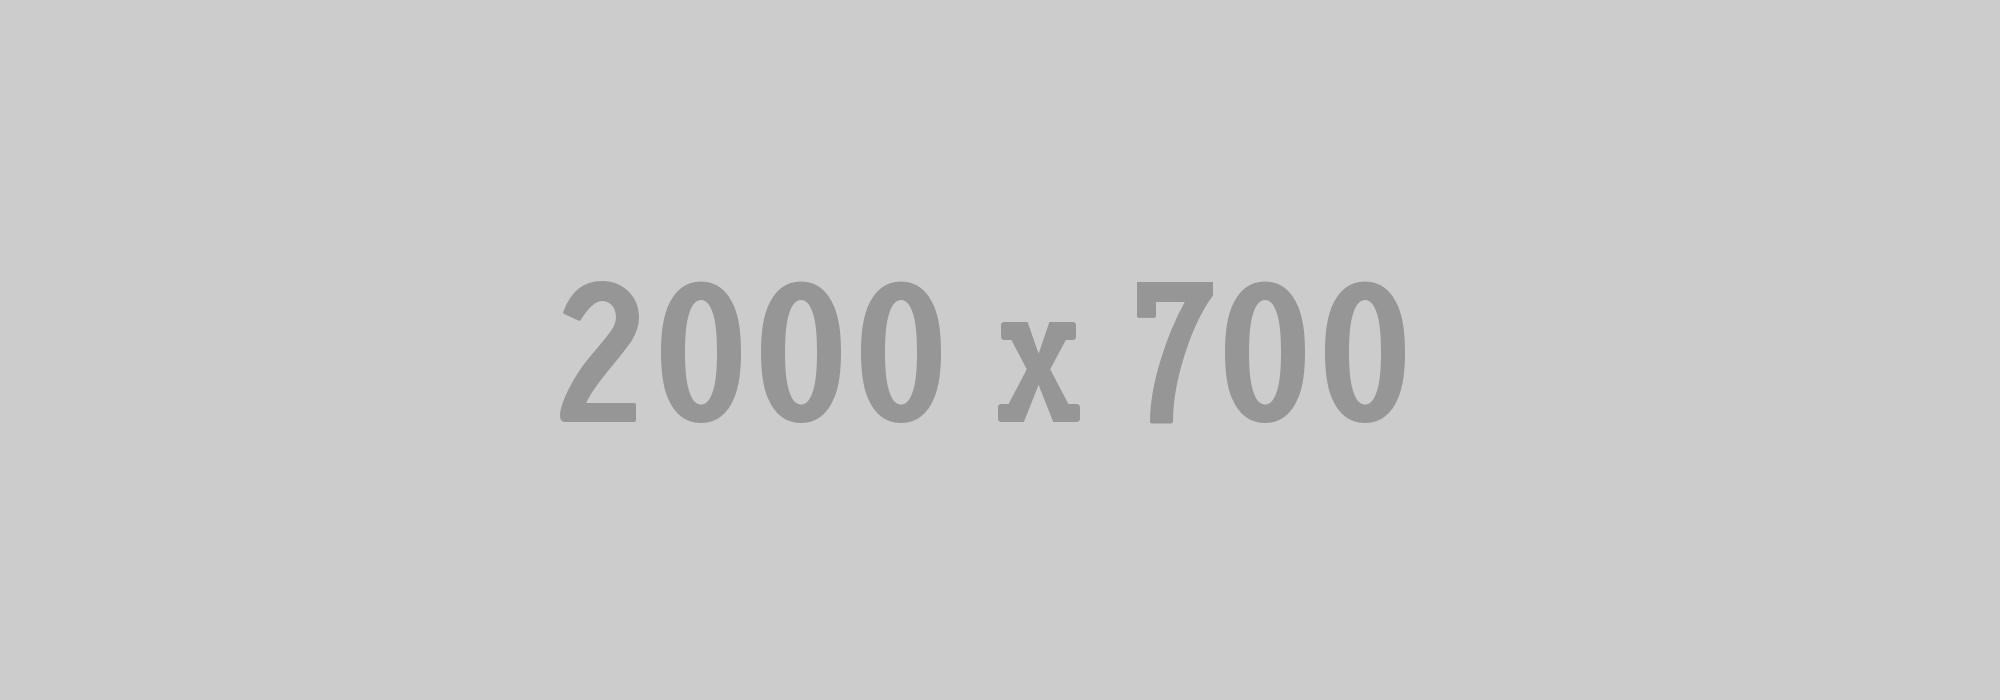 2000x700